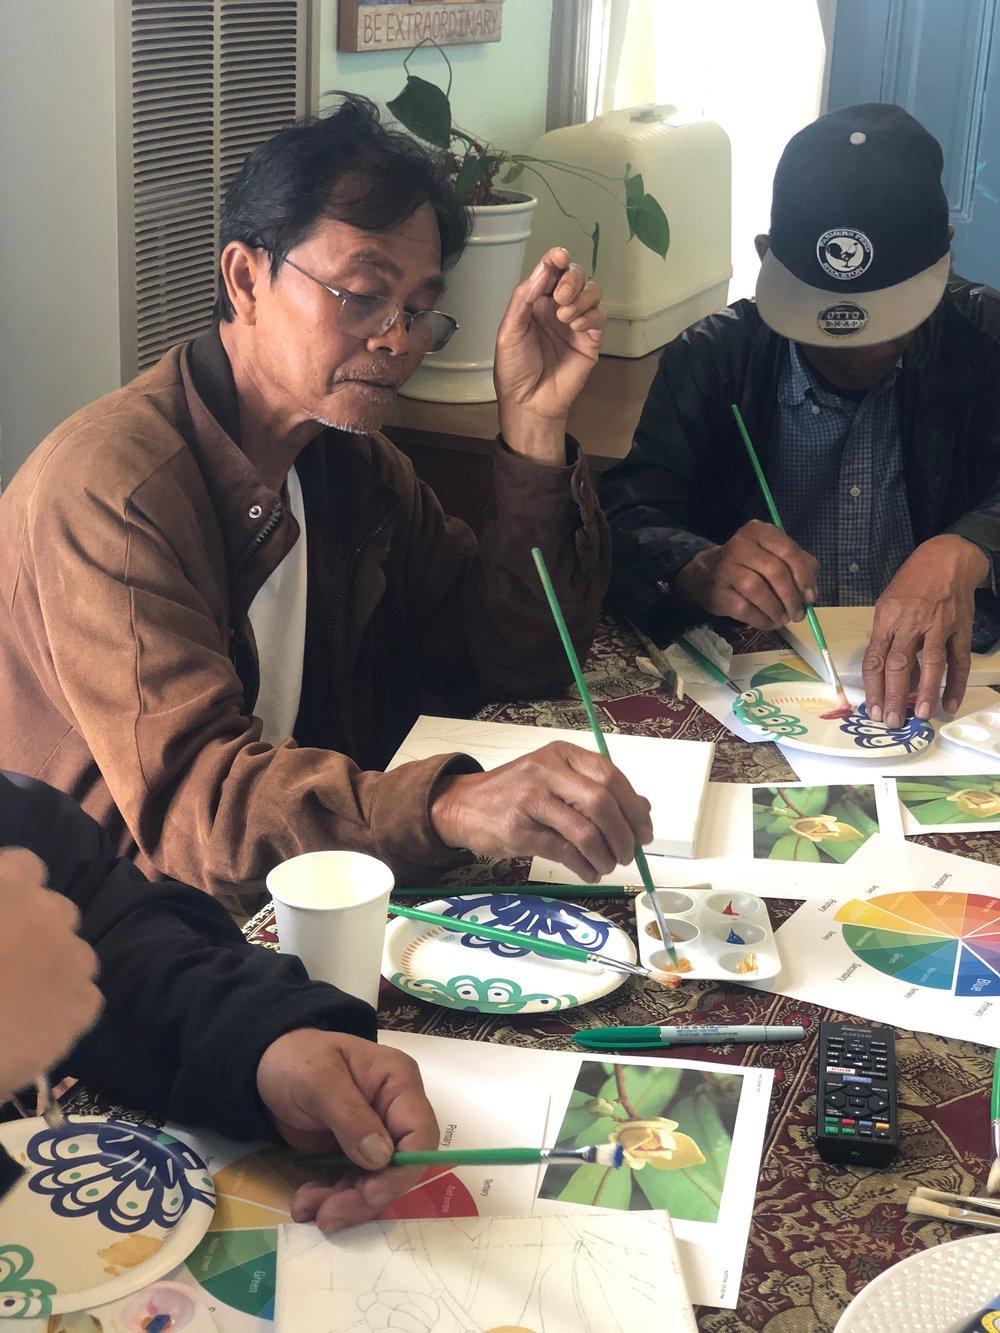 men-oil-painting-artogether-april-4.jpg